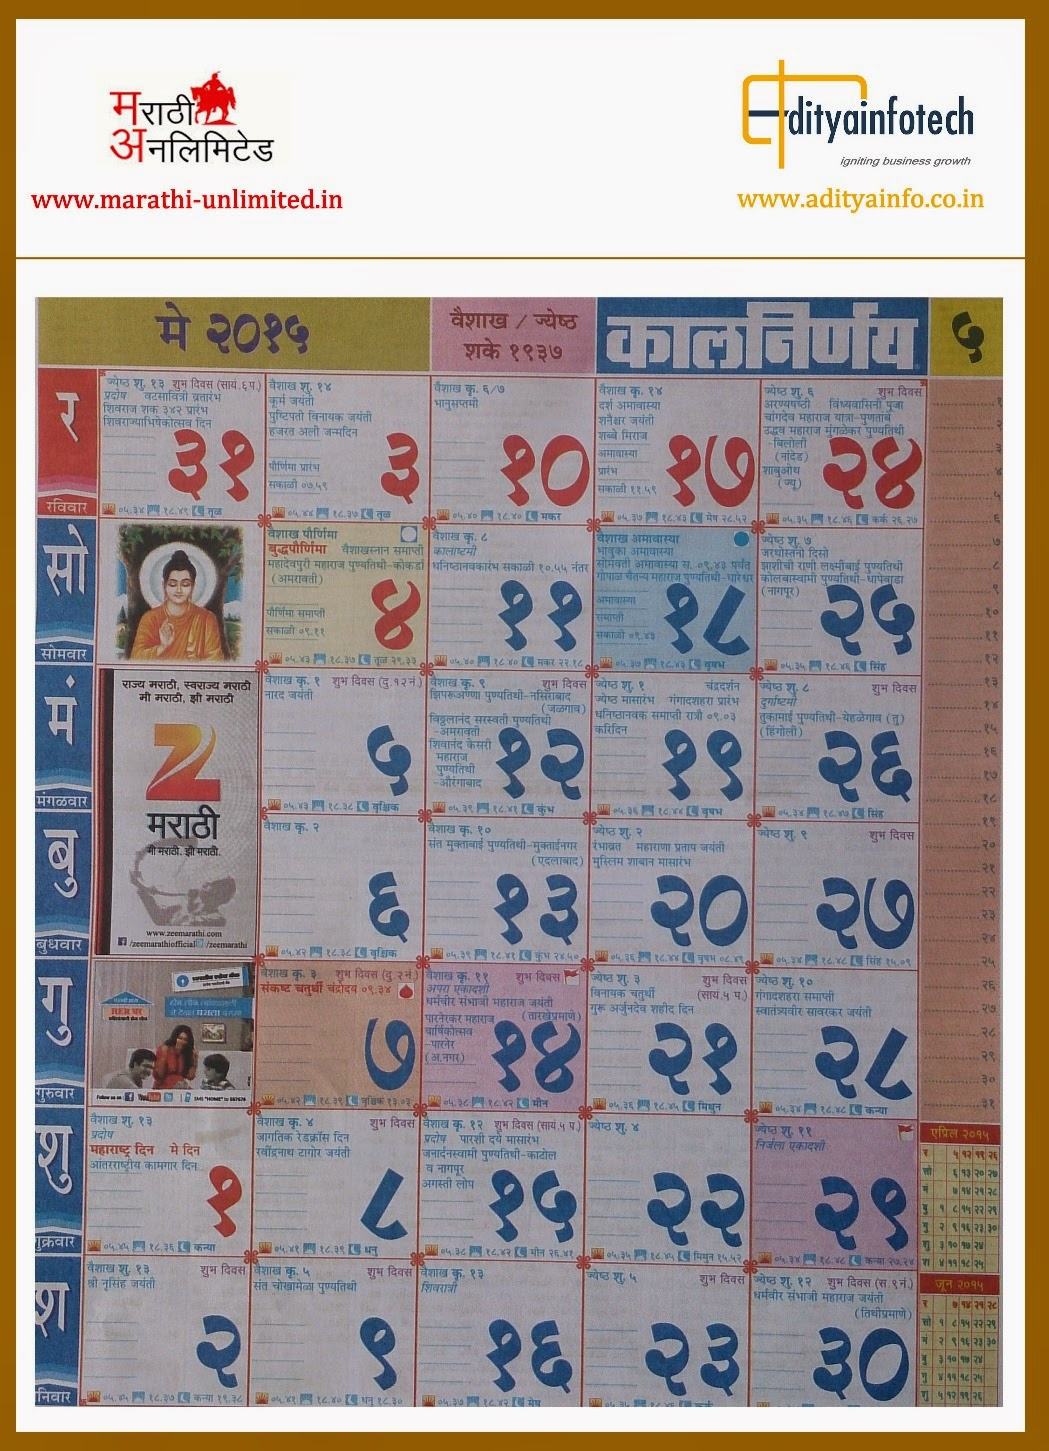 Kalnirnay Marathi Calendar January 2016 – Pictures, Images and ...